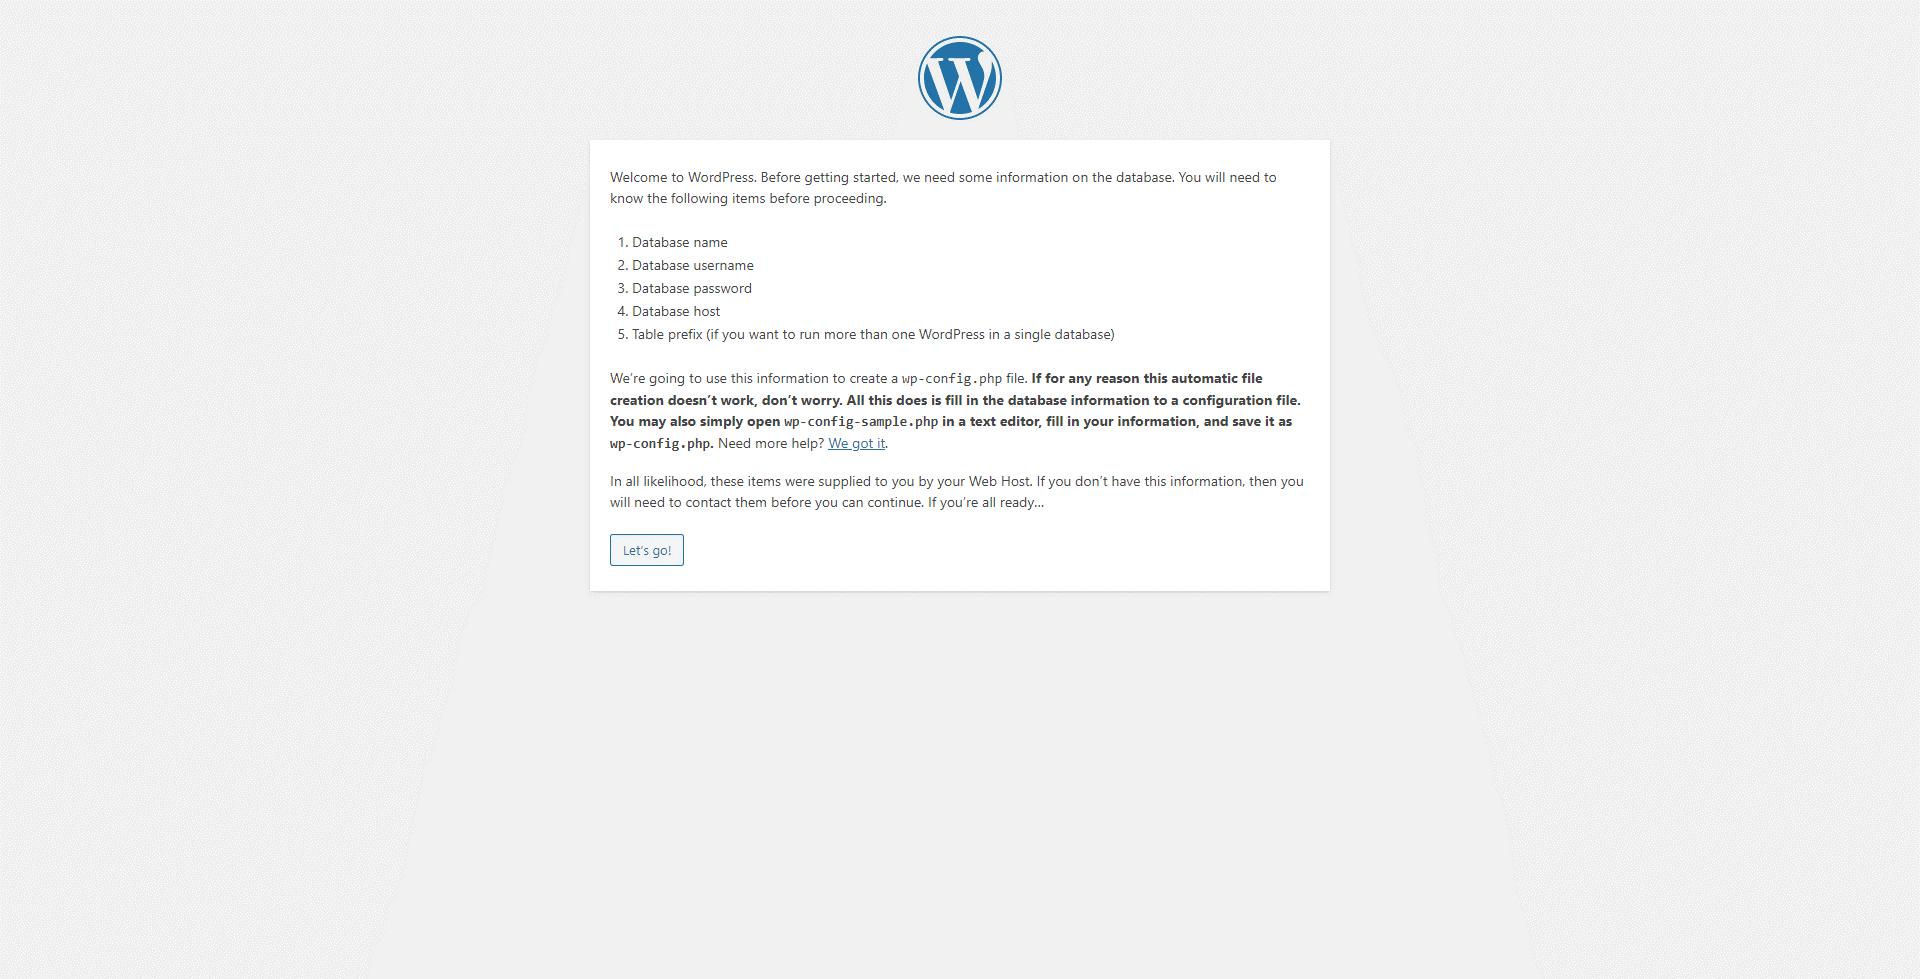 The WordPress installation welcome screen